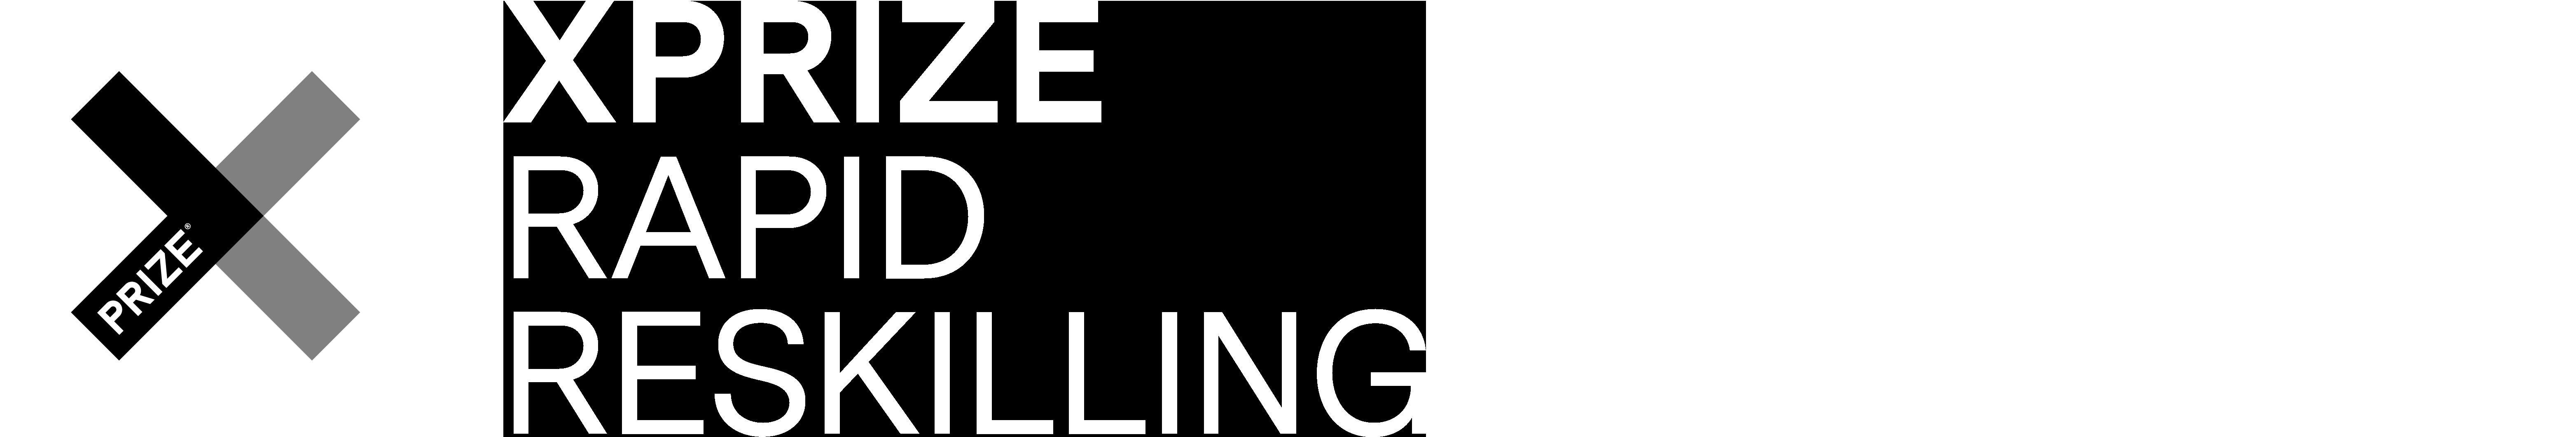 XPRIZE RAPID RESKILLING - NEW PROFIT